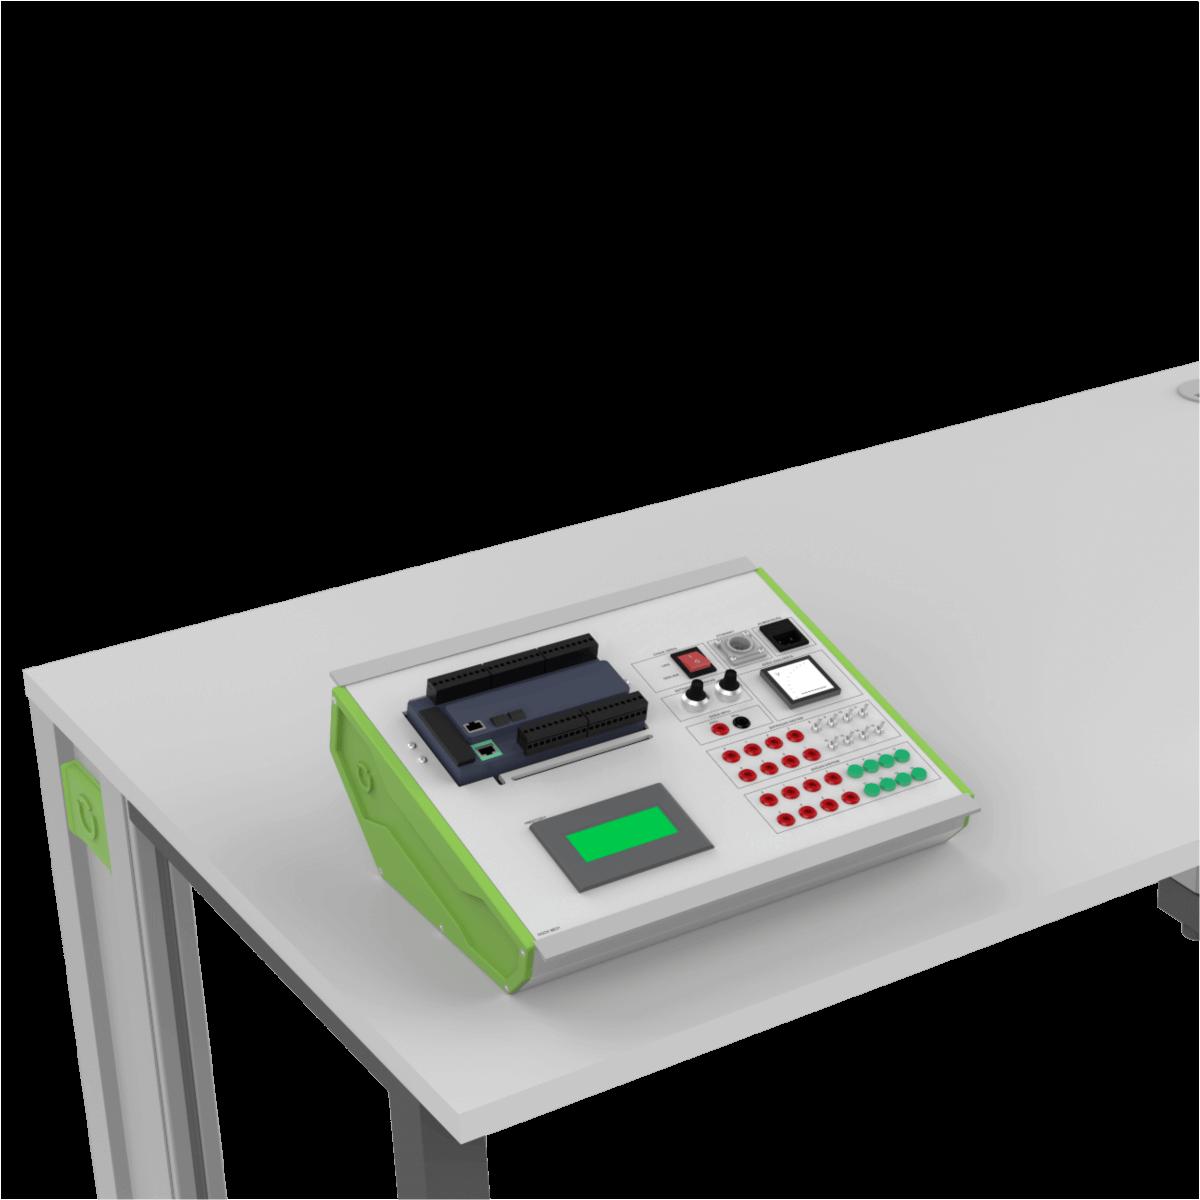 lab-automacao-bancada-didatica-dock-station-m221_1-auttom-5